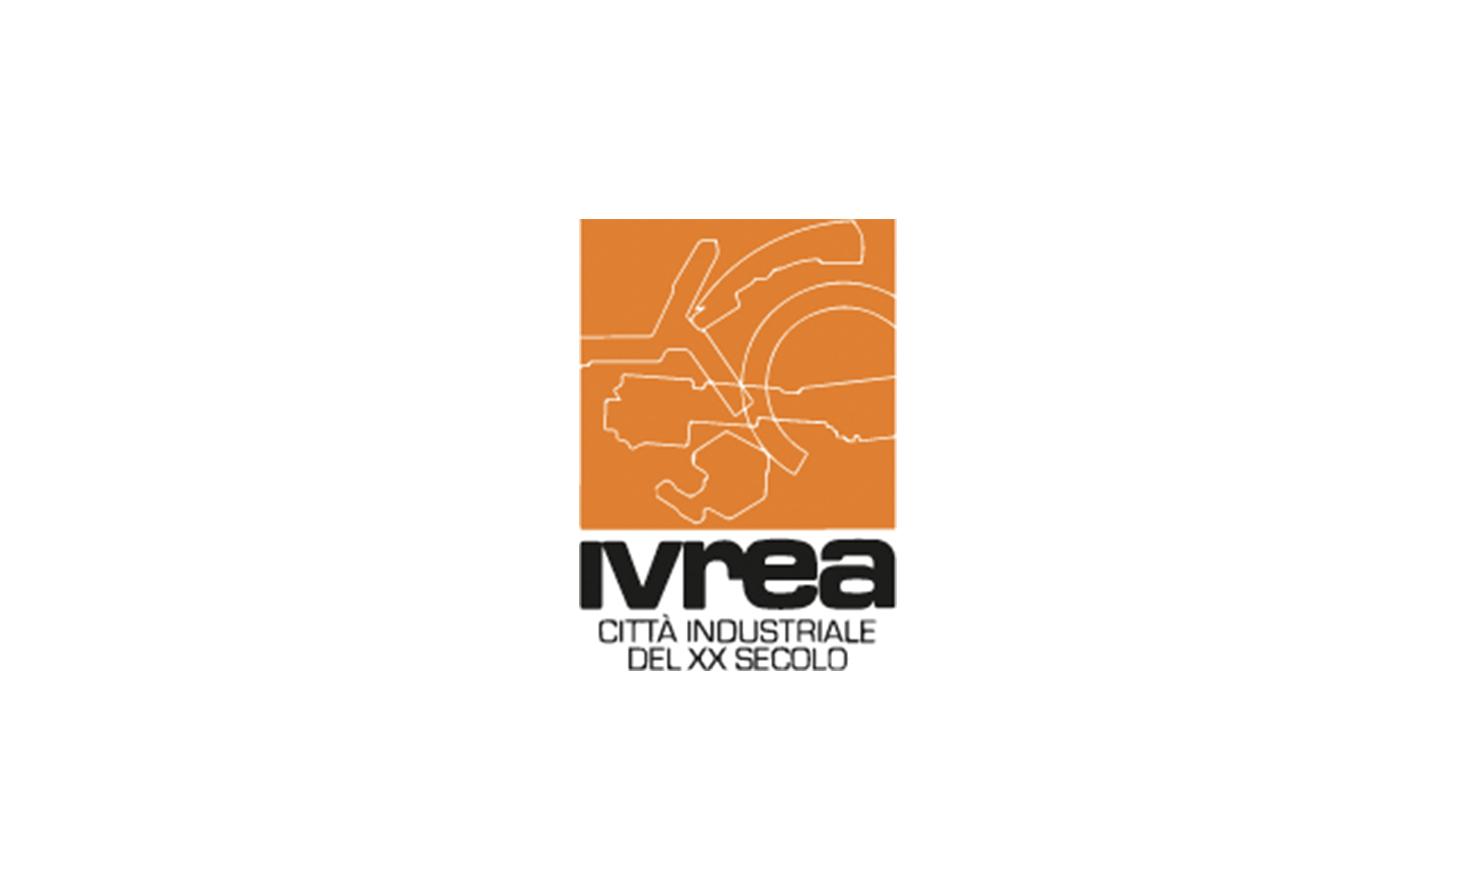 https://kubelibre.com/uploads/Slider-work-tutti-clienti/ivrea-e-unesco-città-industriale-del-xx-secolo-logo-2.jpg